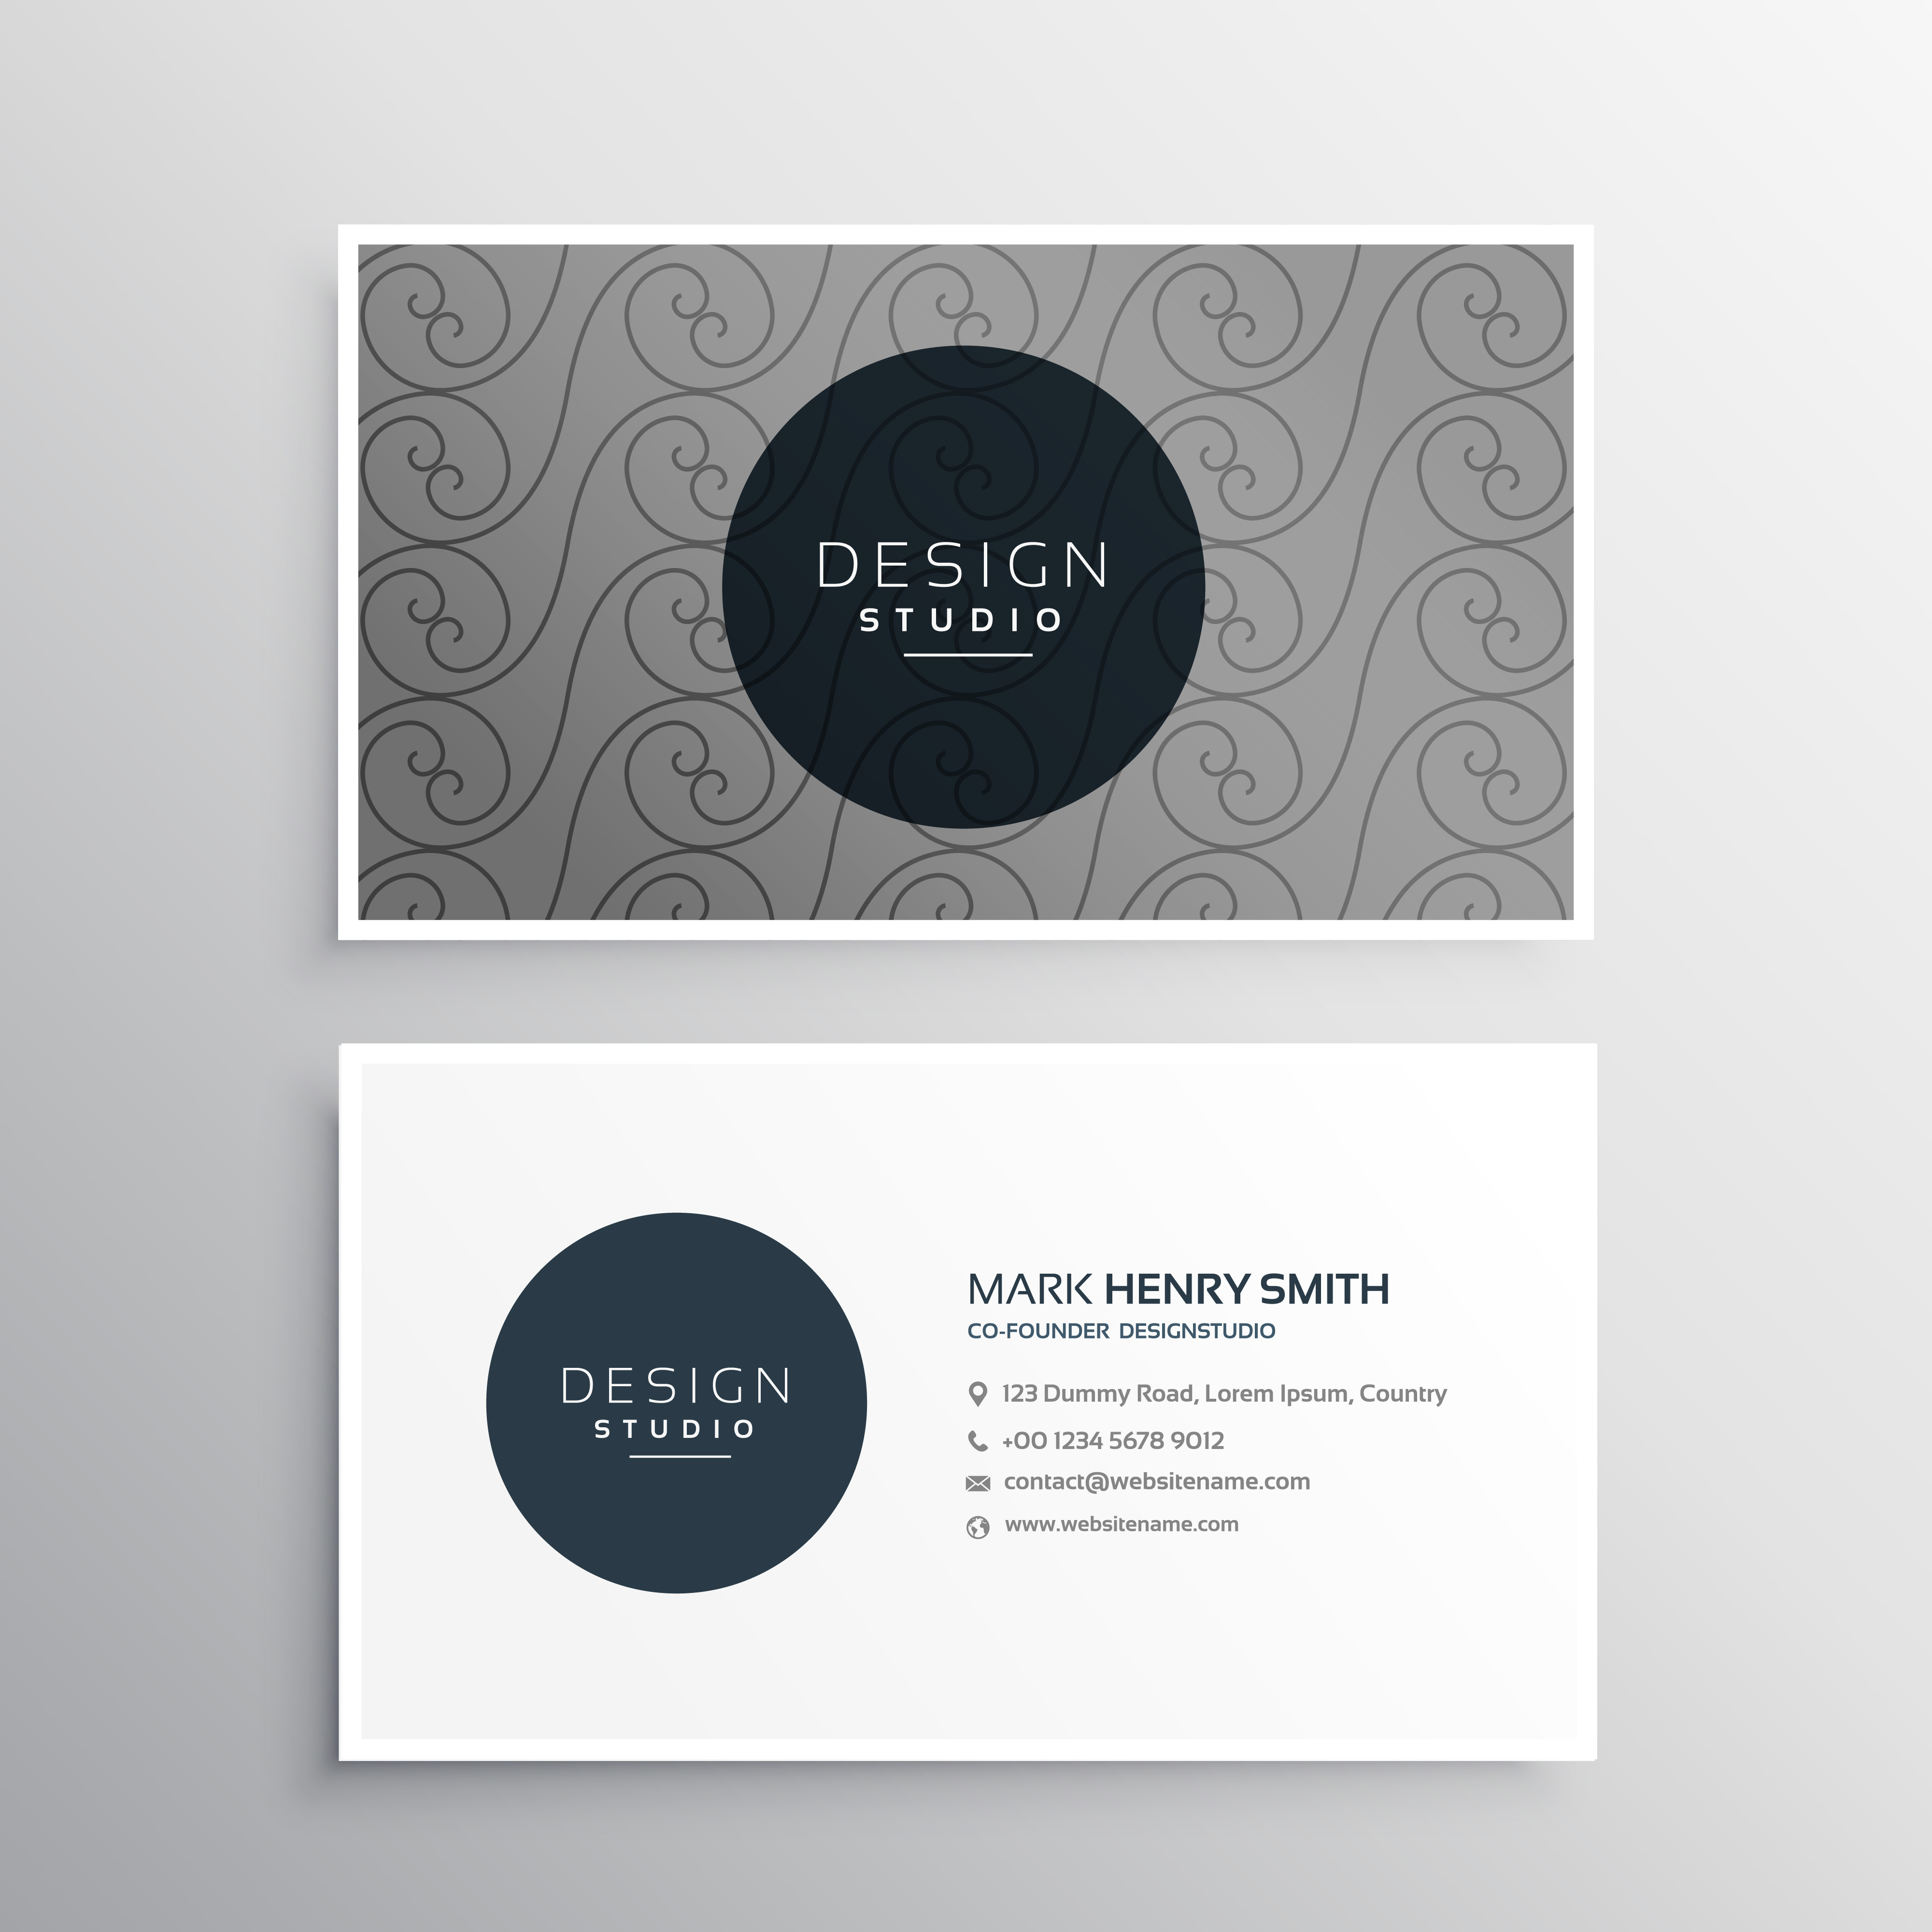 Professional business card design in gray color with pattern sha professional business card design in gray color with pattern sha download vetores e grficos gratuitos reheart Choice Image